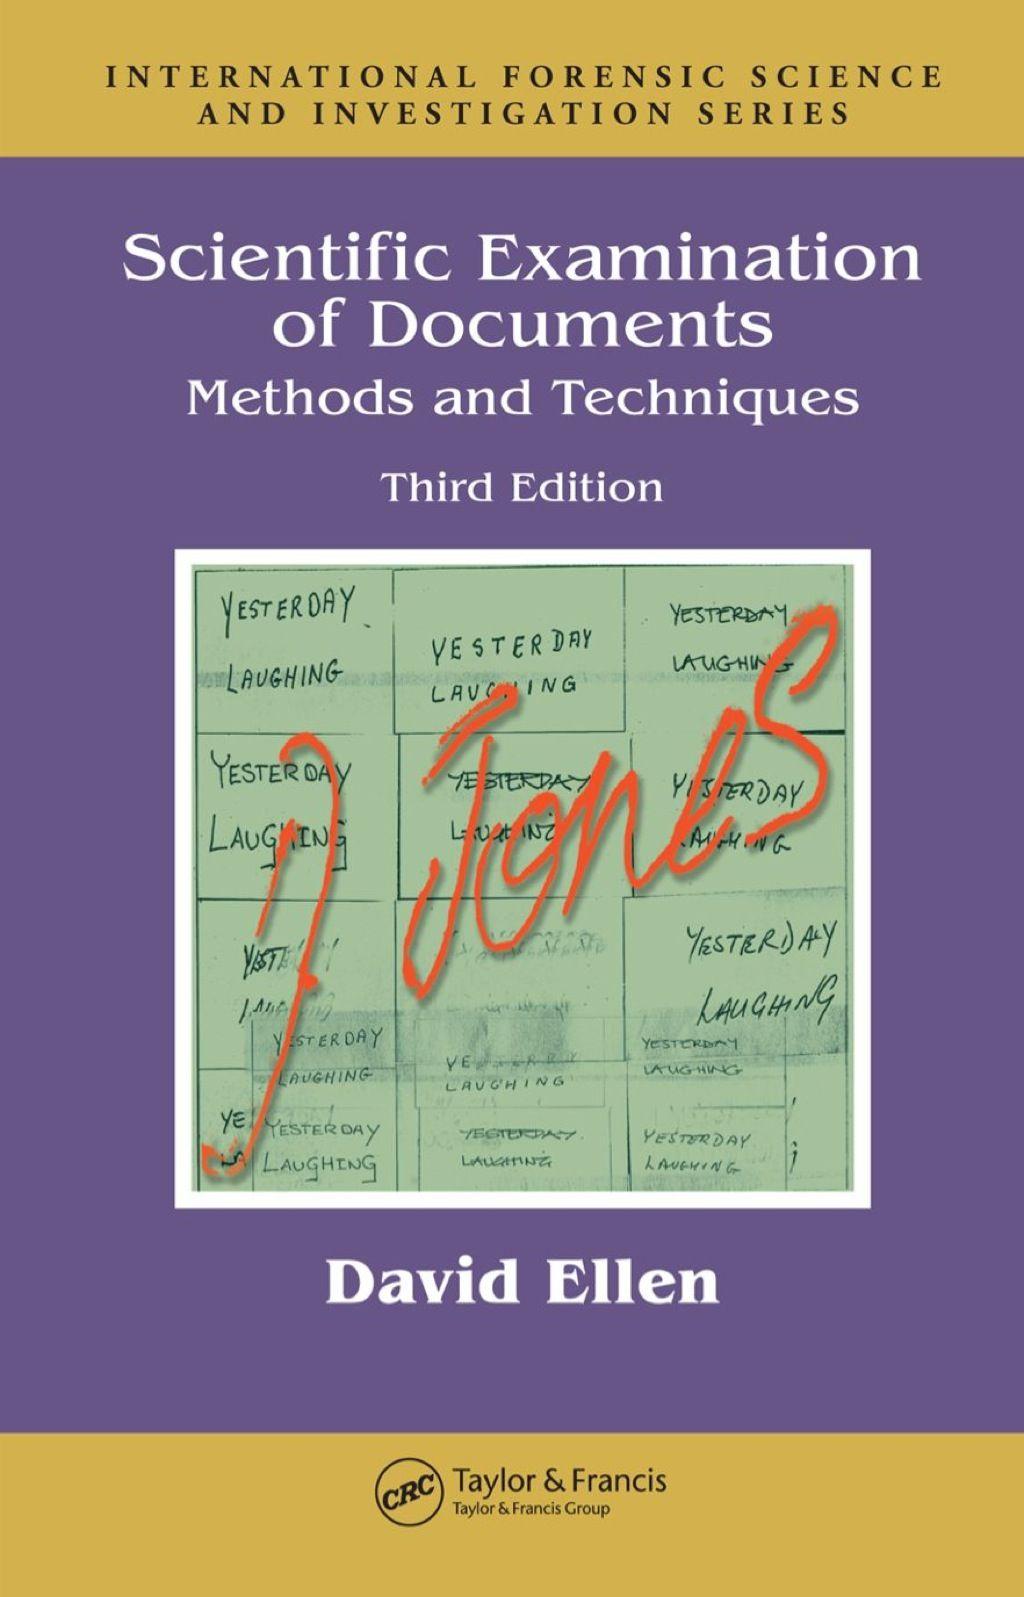 Scientific Examination Of Documents Ebook Rental